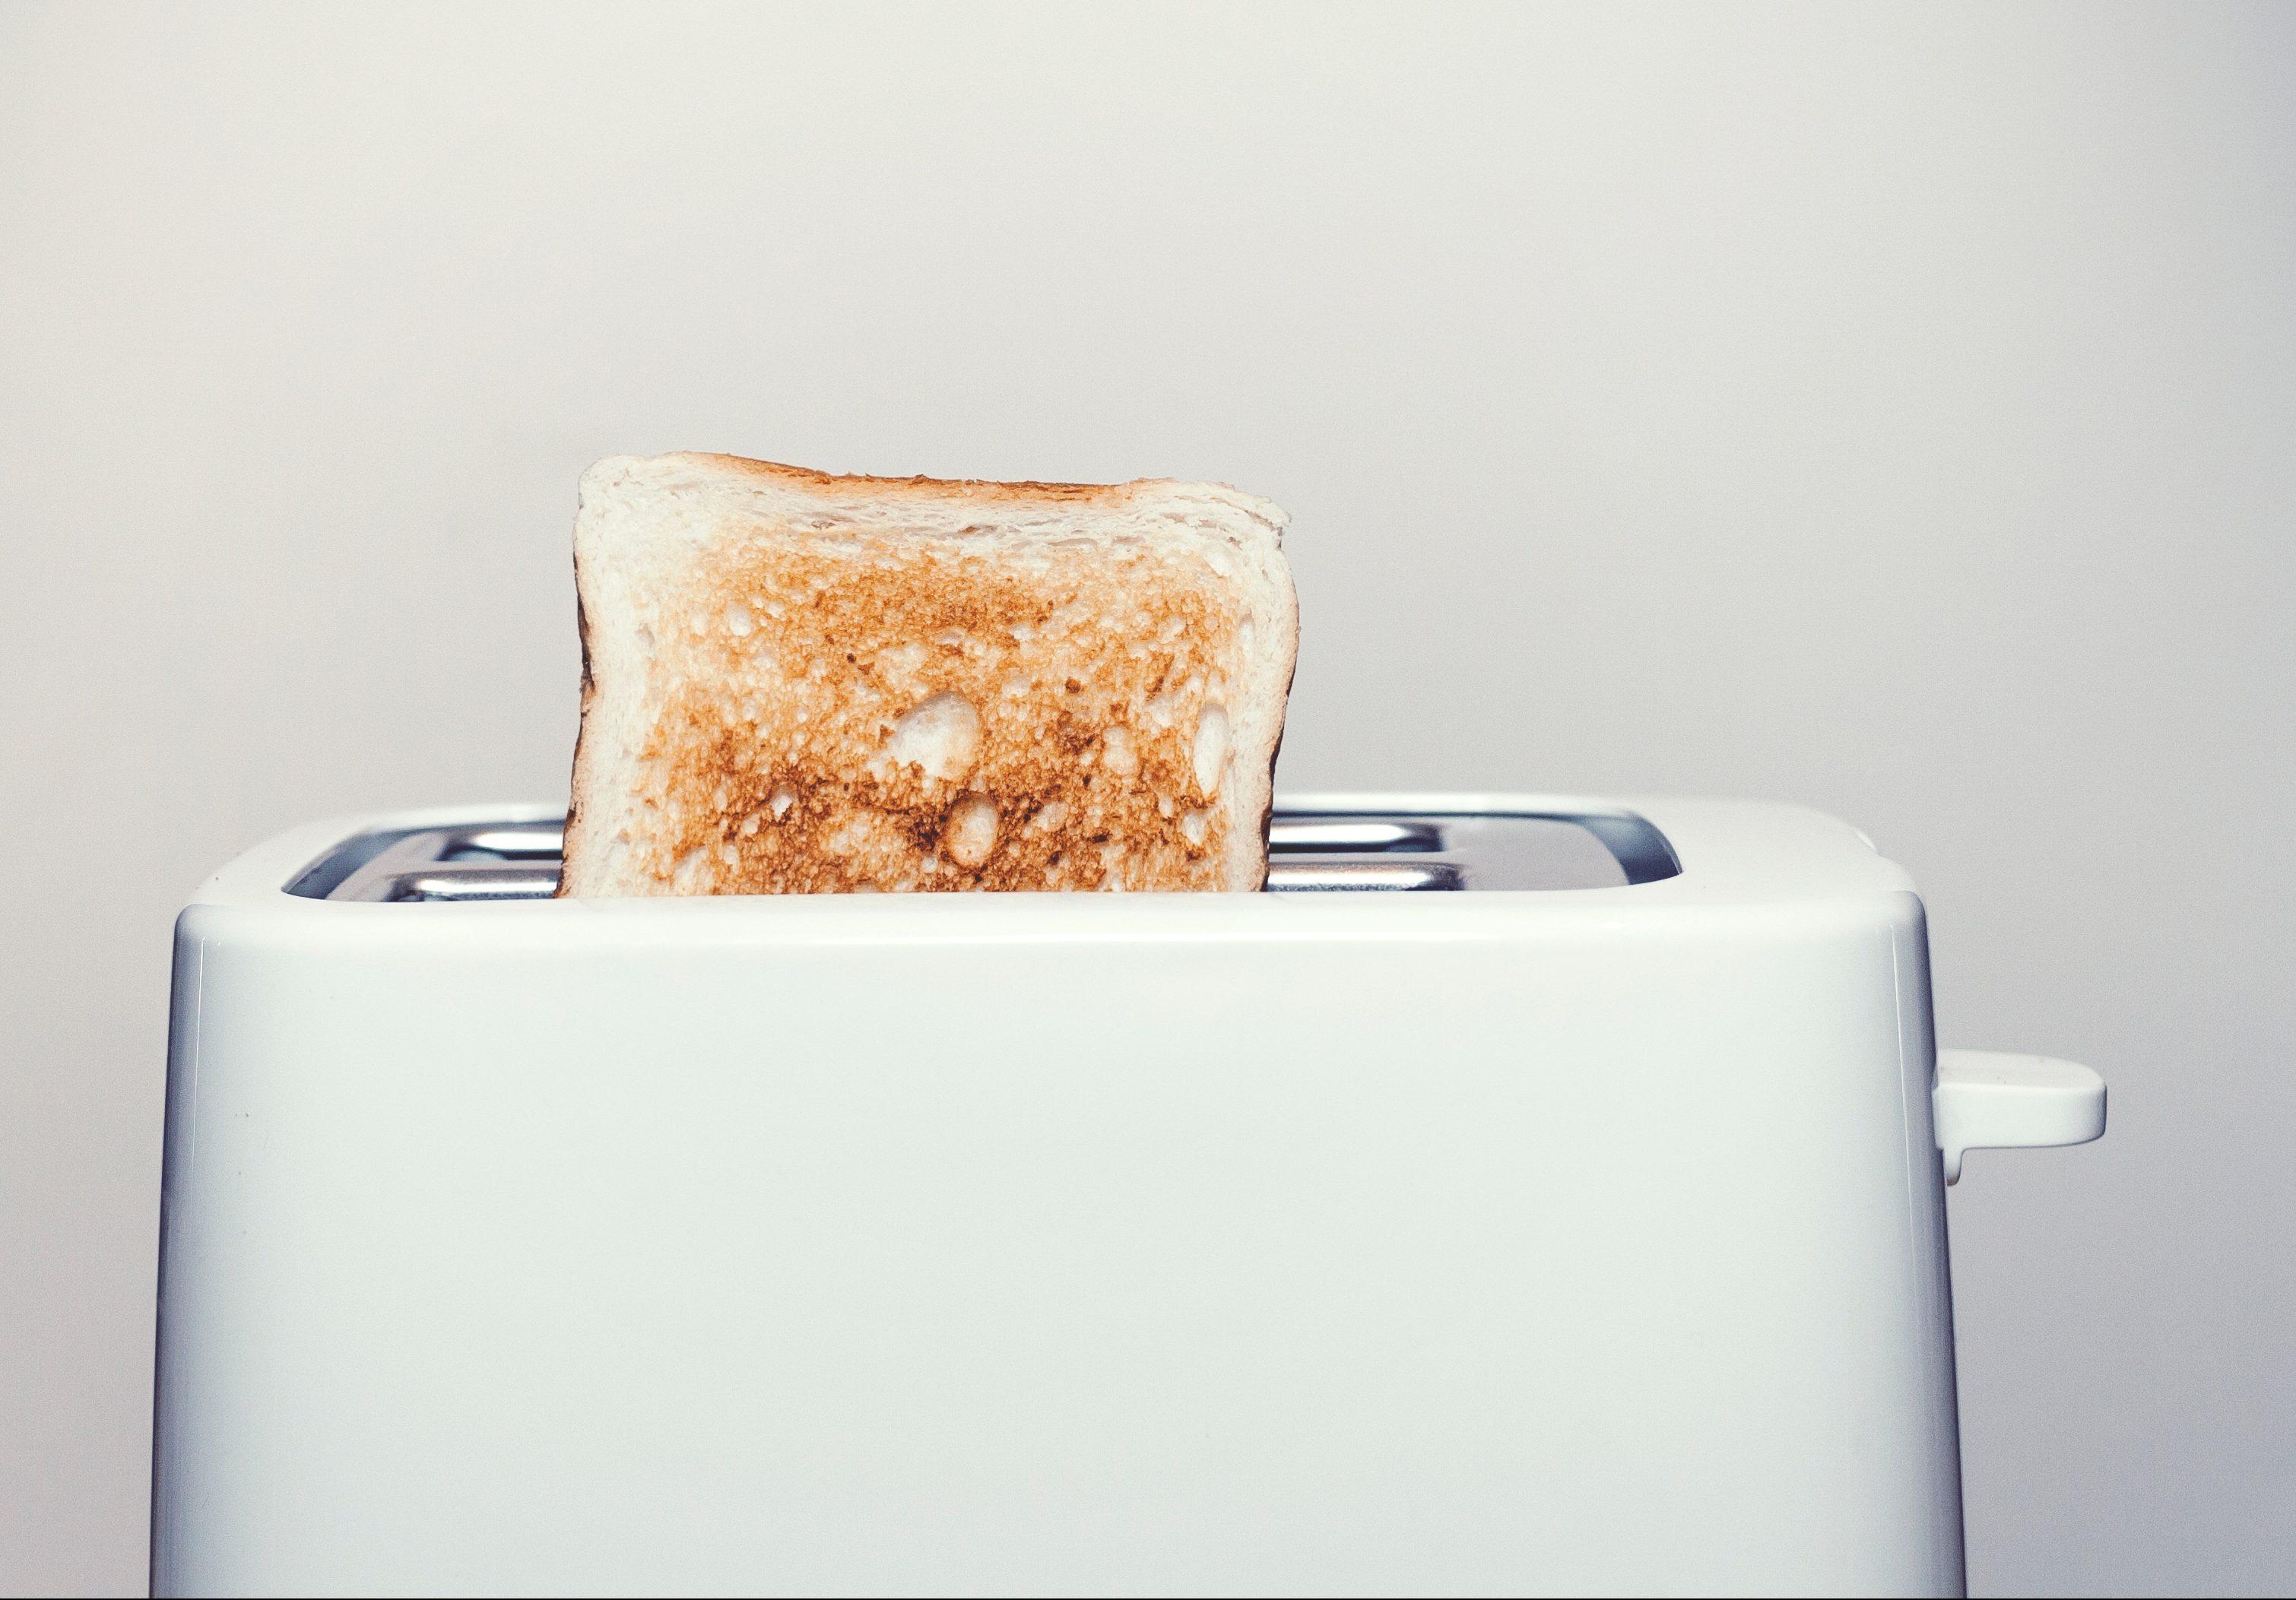 Toaster mit Scheibe Toast